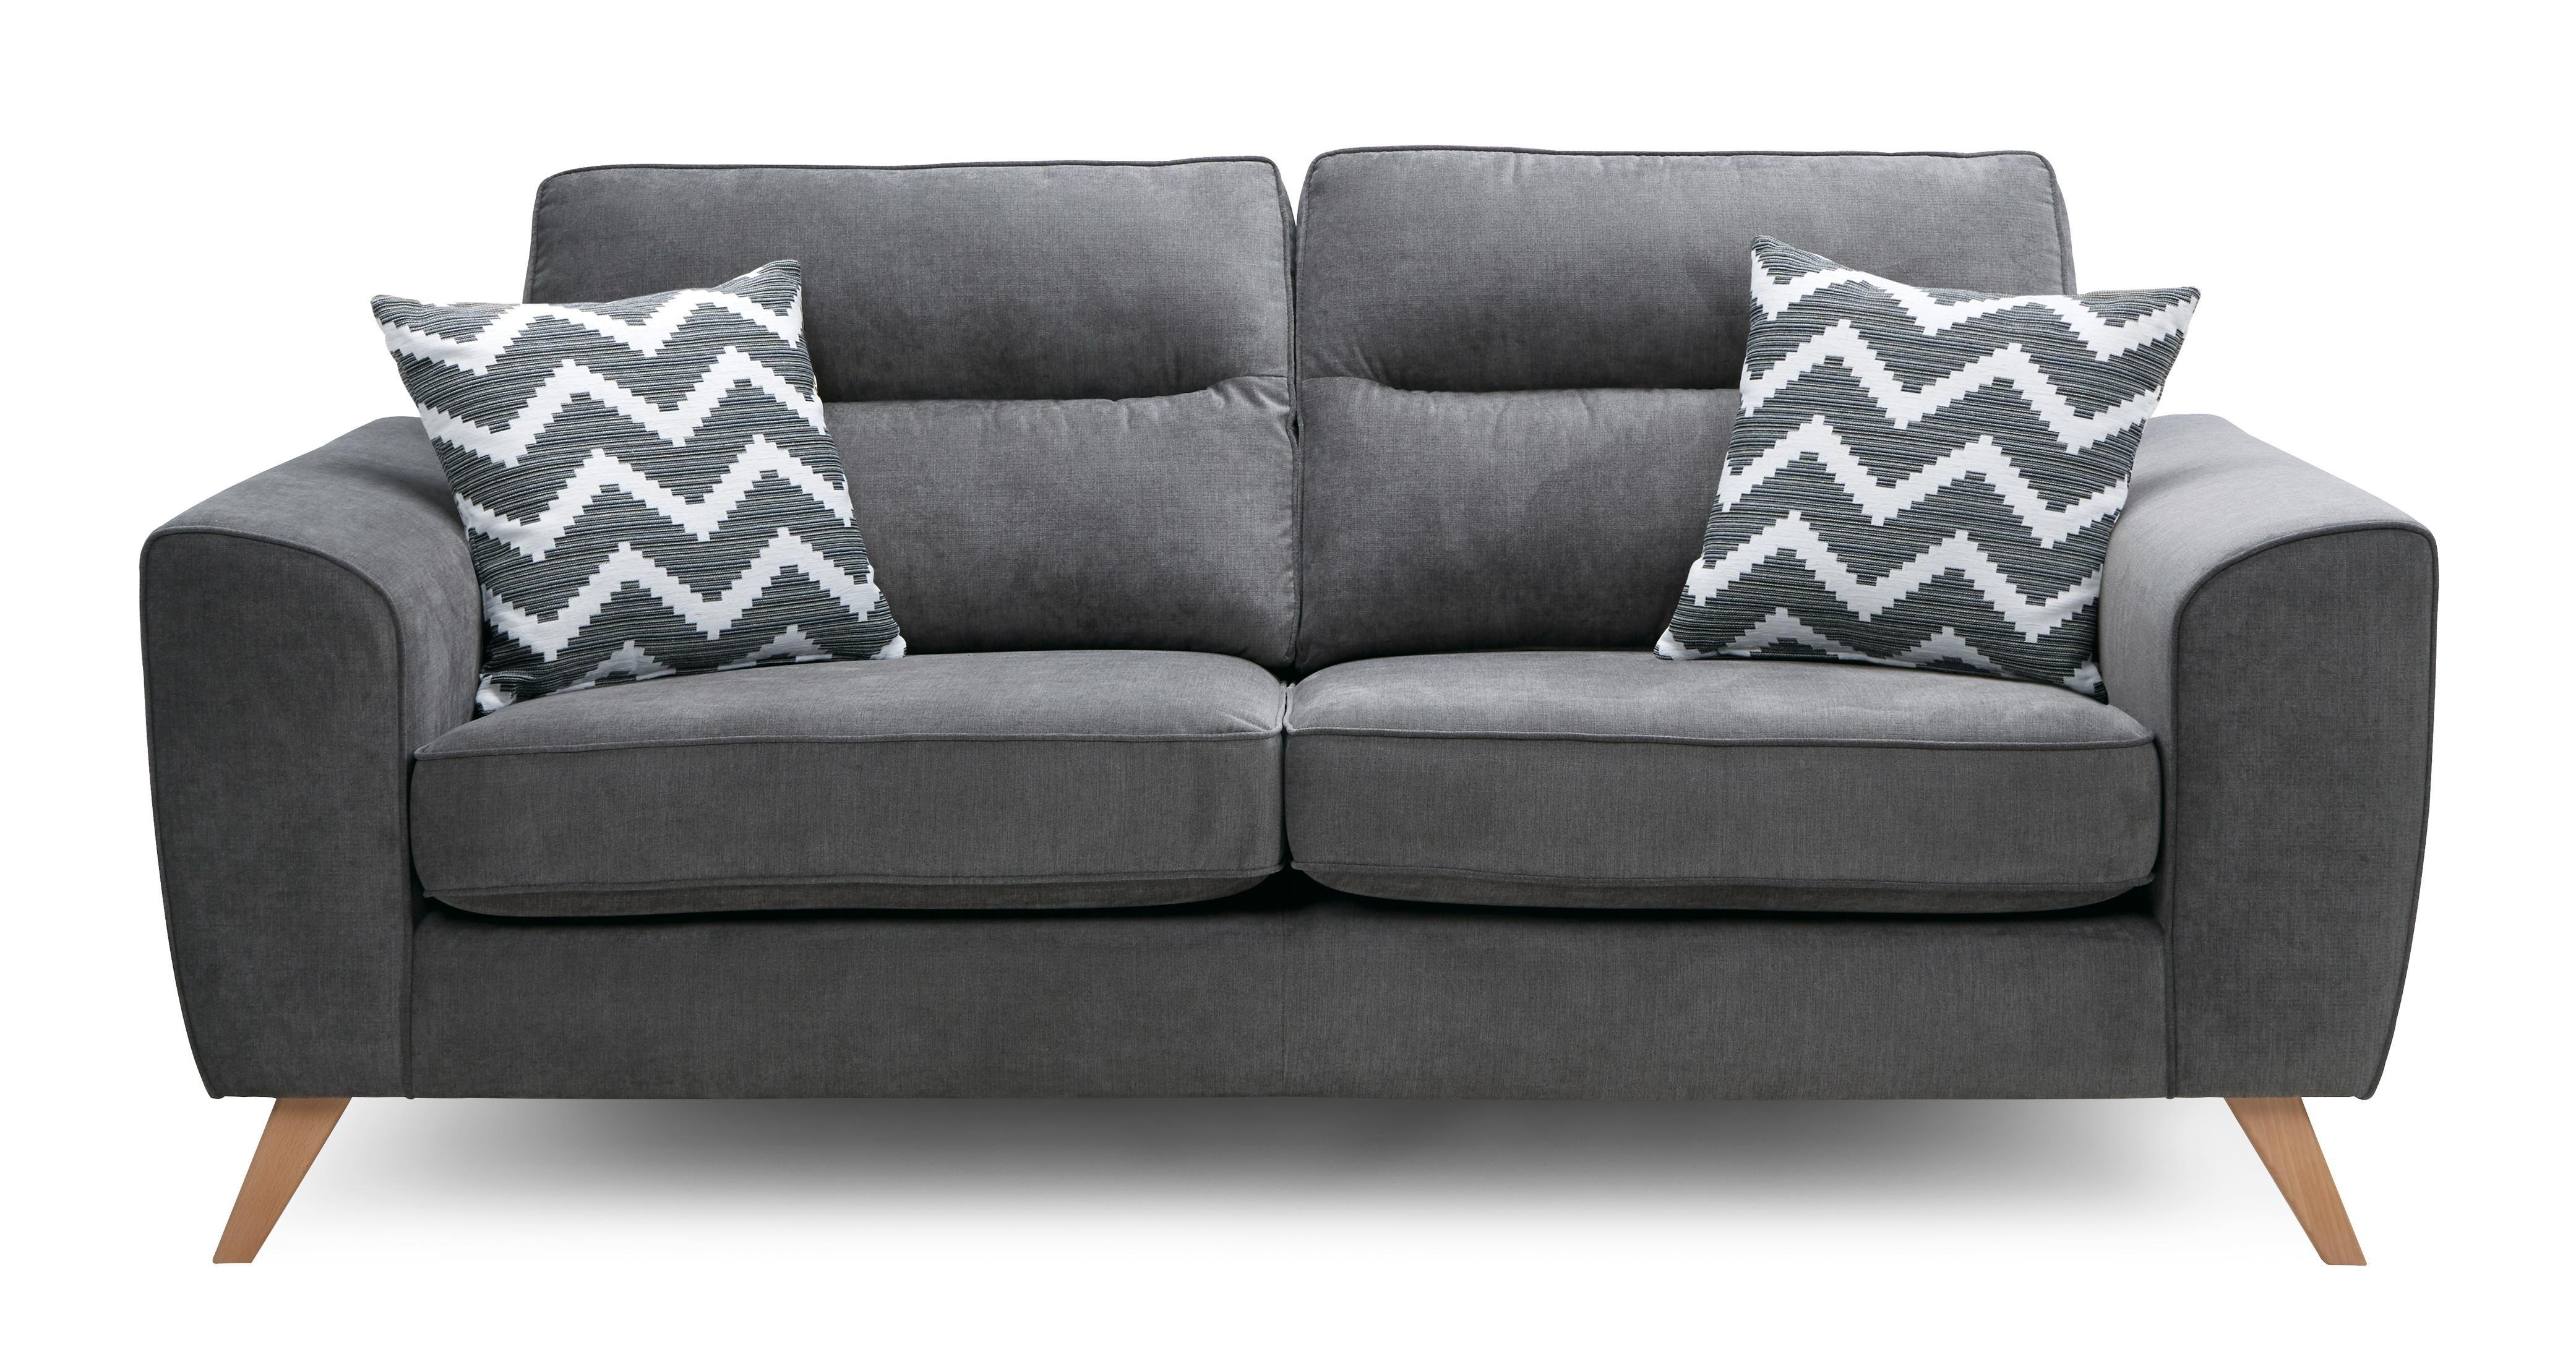 Pin by Sarah Evans on new house buy Fabric sofa, Corner